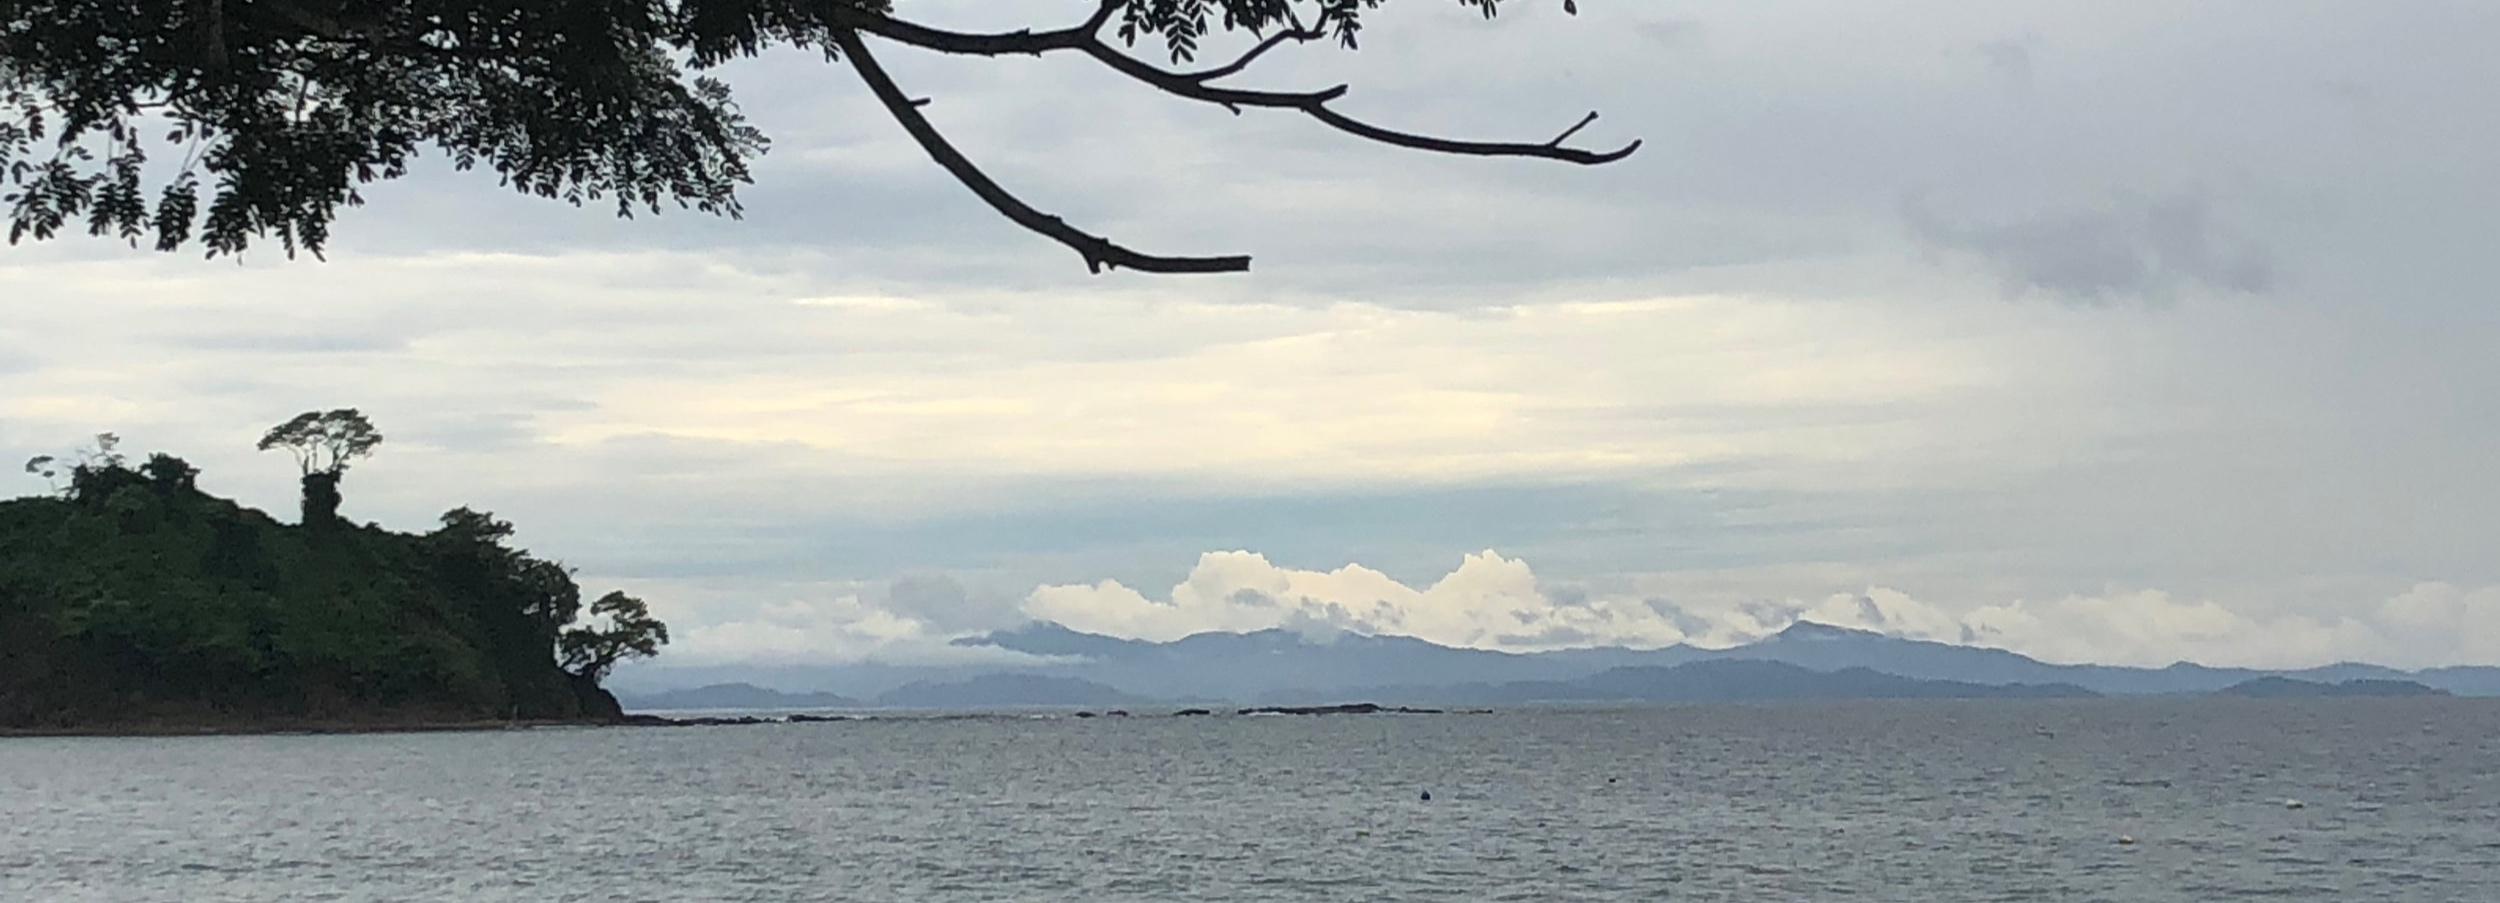 View from Playa Mantas, near Garabito, Puntarenas Province, Costa Rica. 14 August 2019.